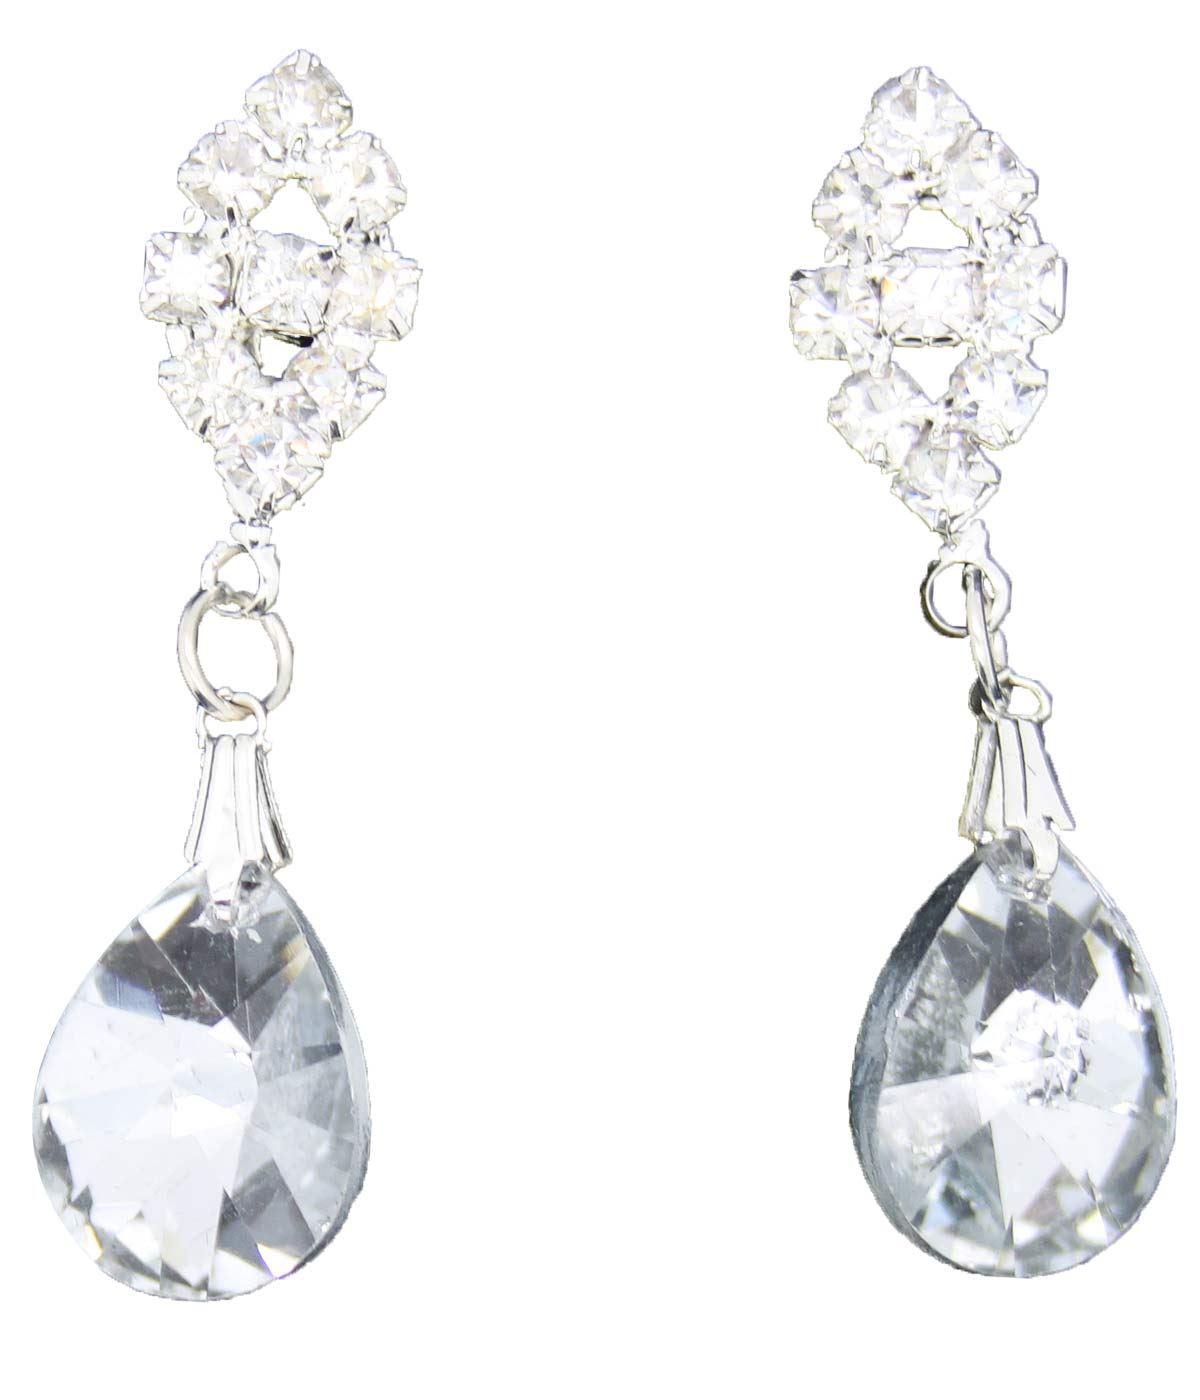 True-Face-Ladies-Women-039-s-Elegant-Earrings-Necklace-Set-Metal-Alloy-Jewellery thumbnail 6